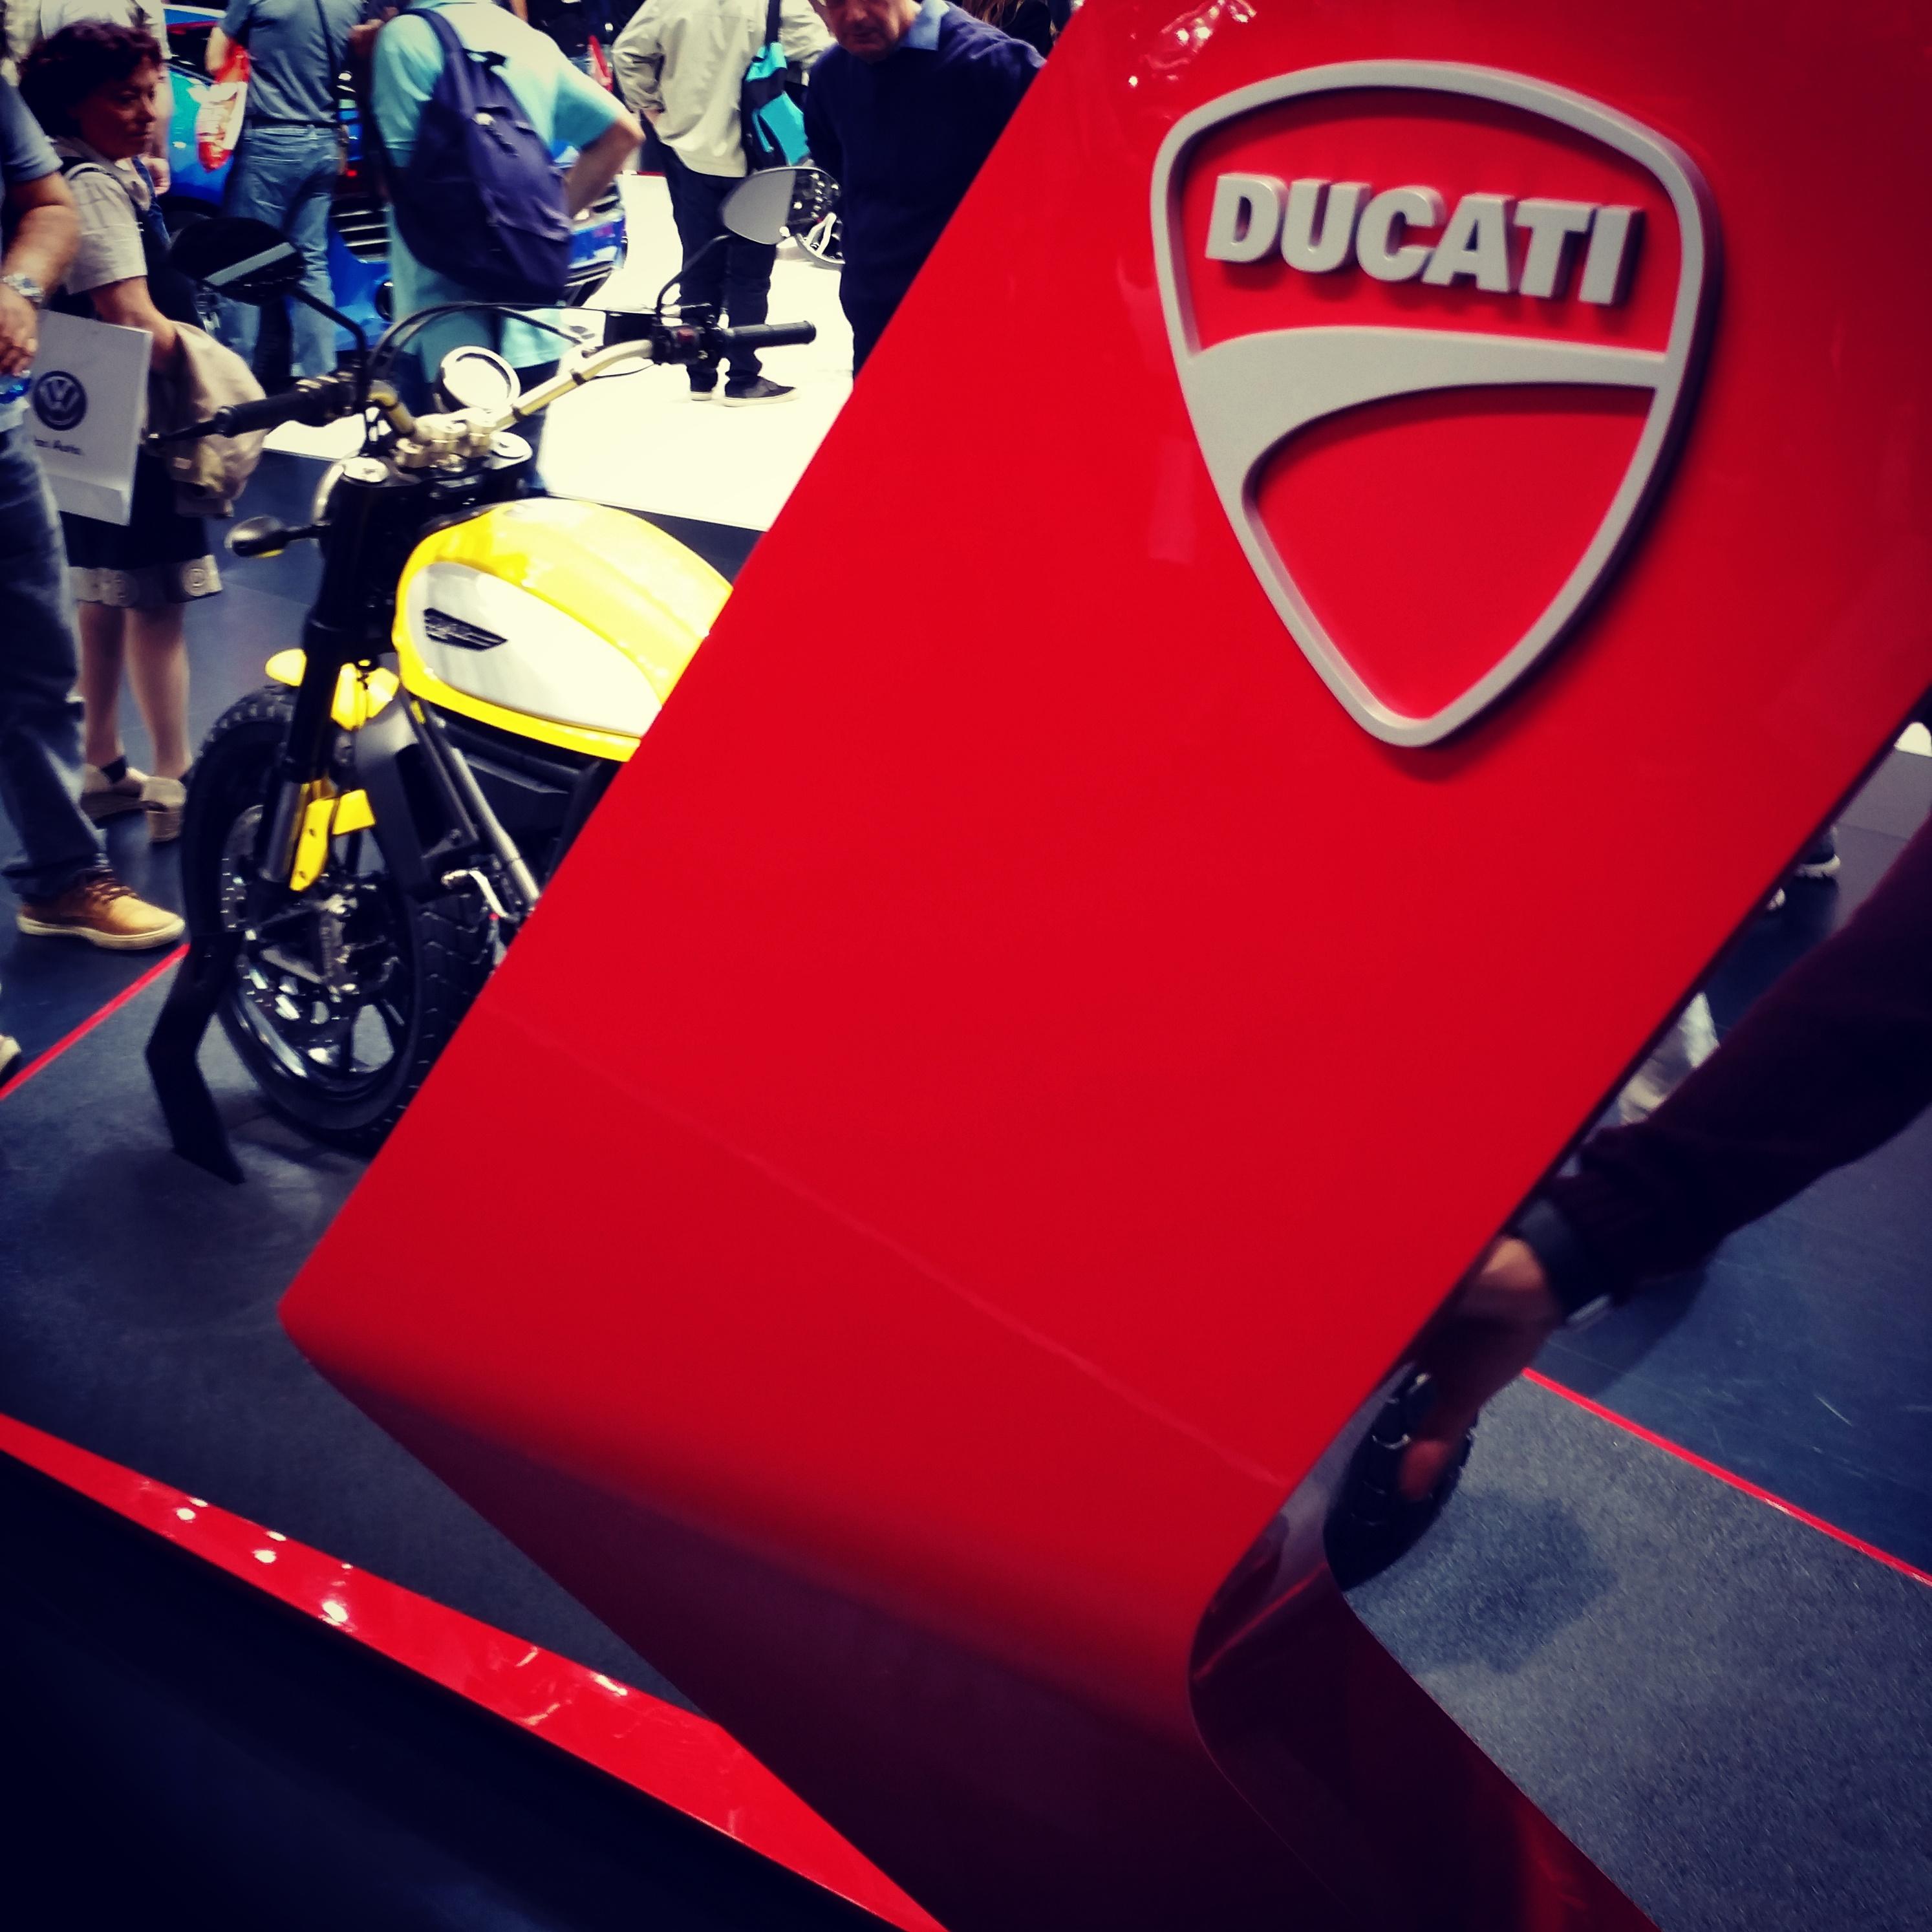 La nouvelle Ducati Scrambler